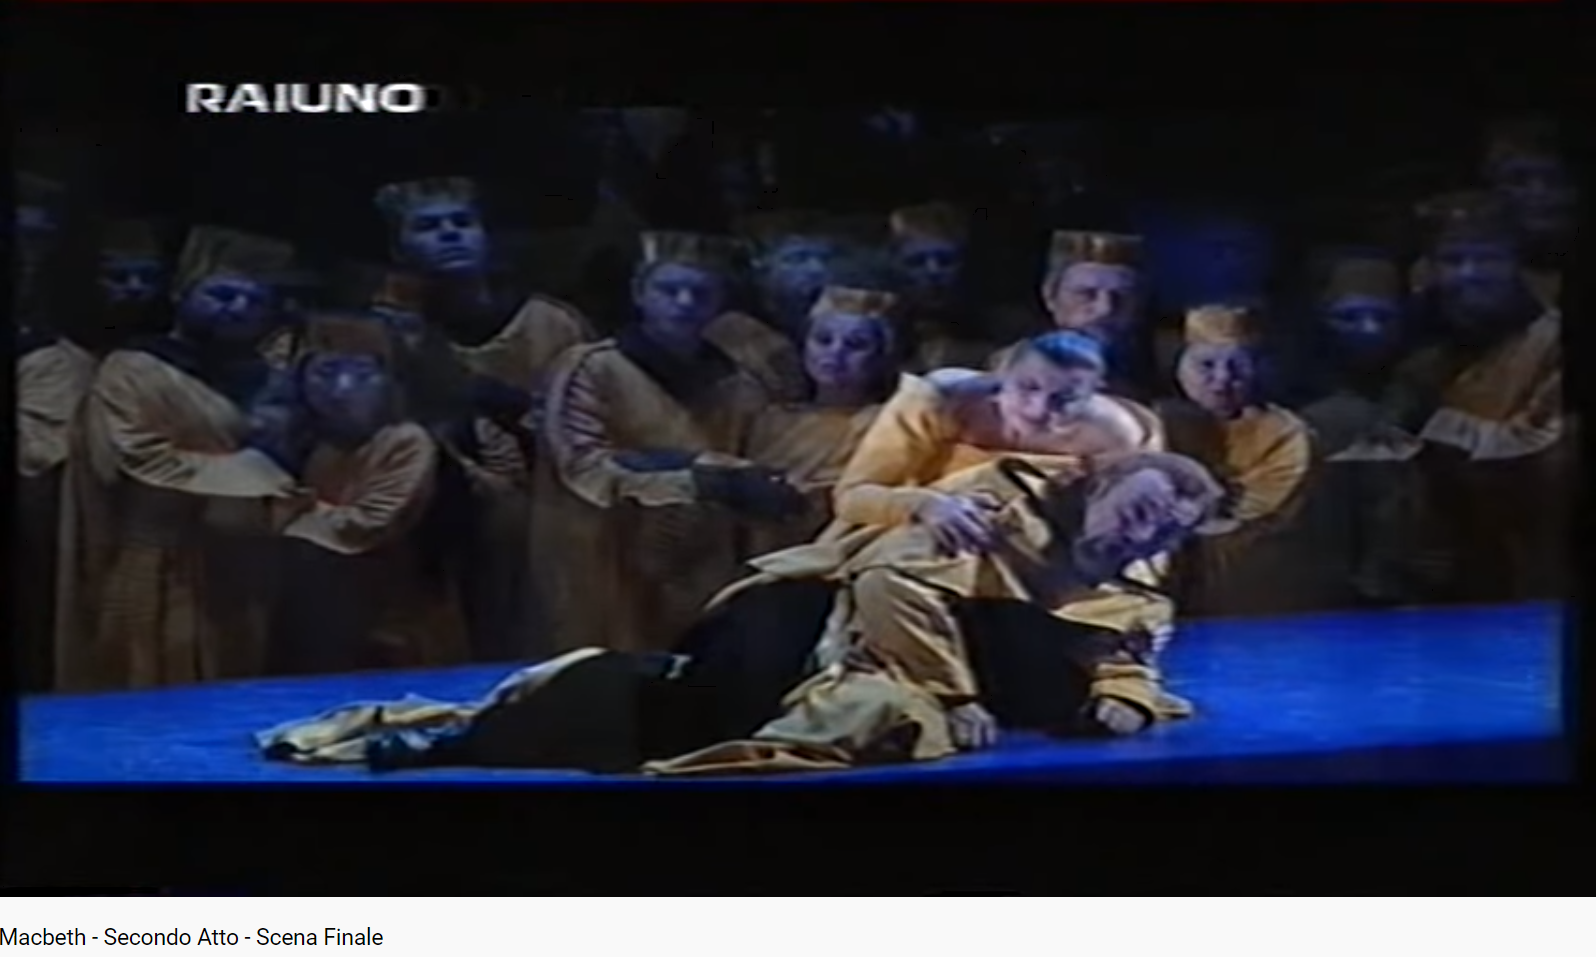 Verdi Macbeth Final acte II